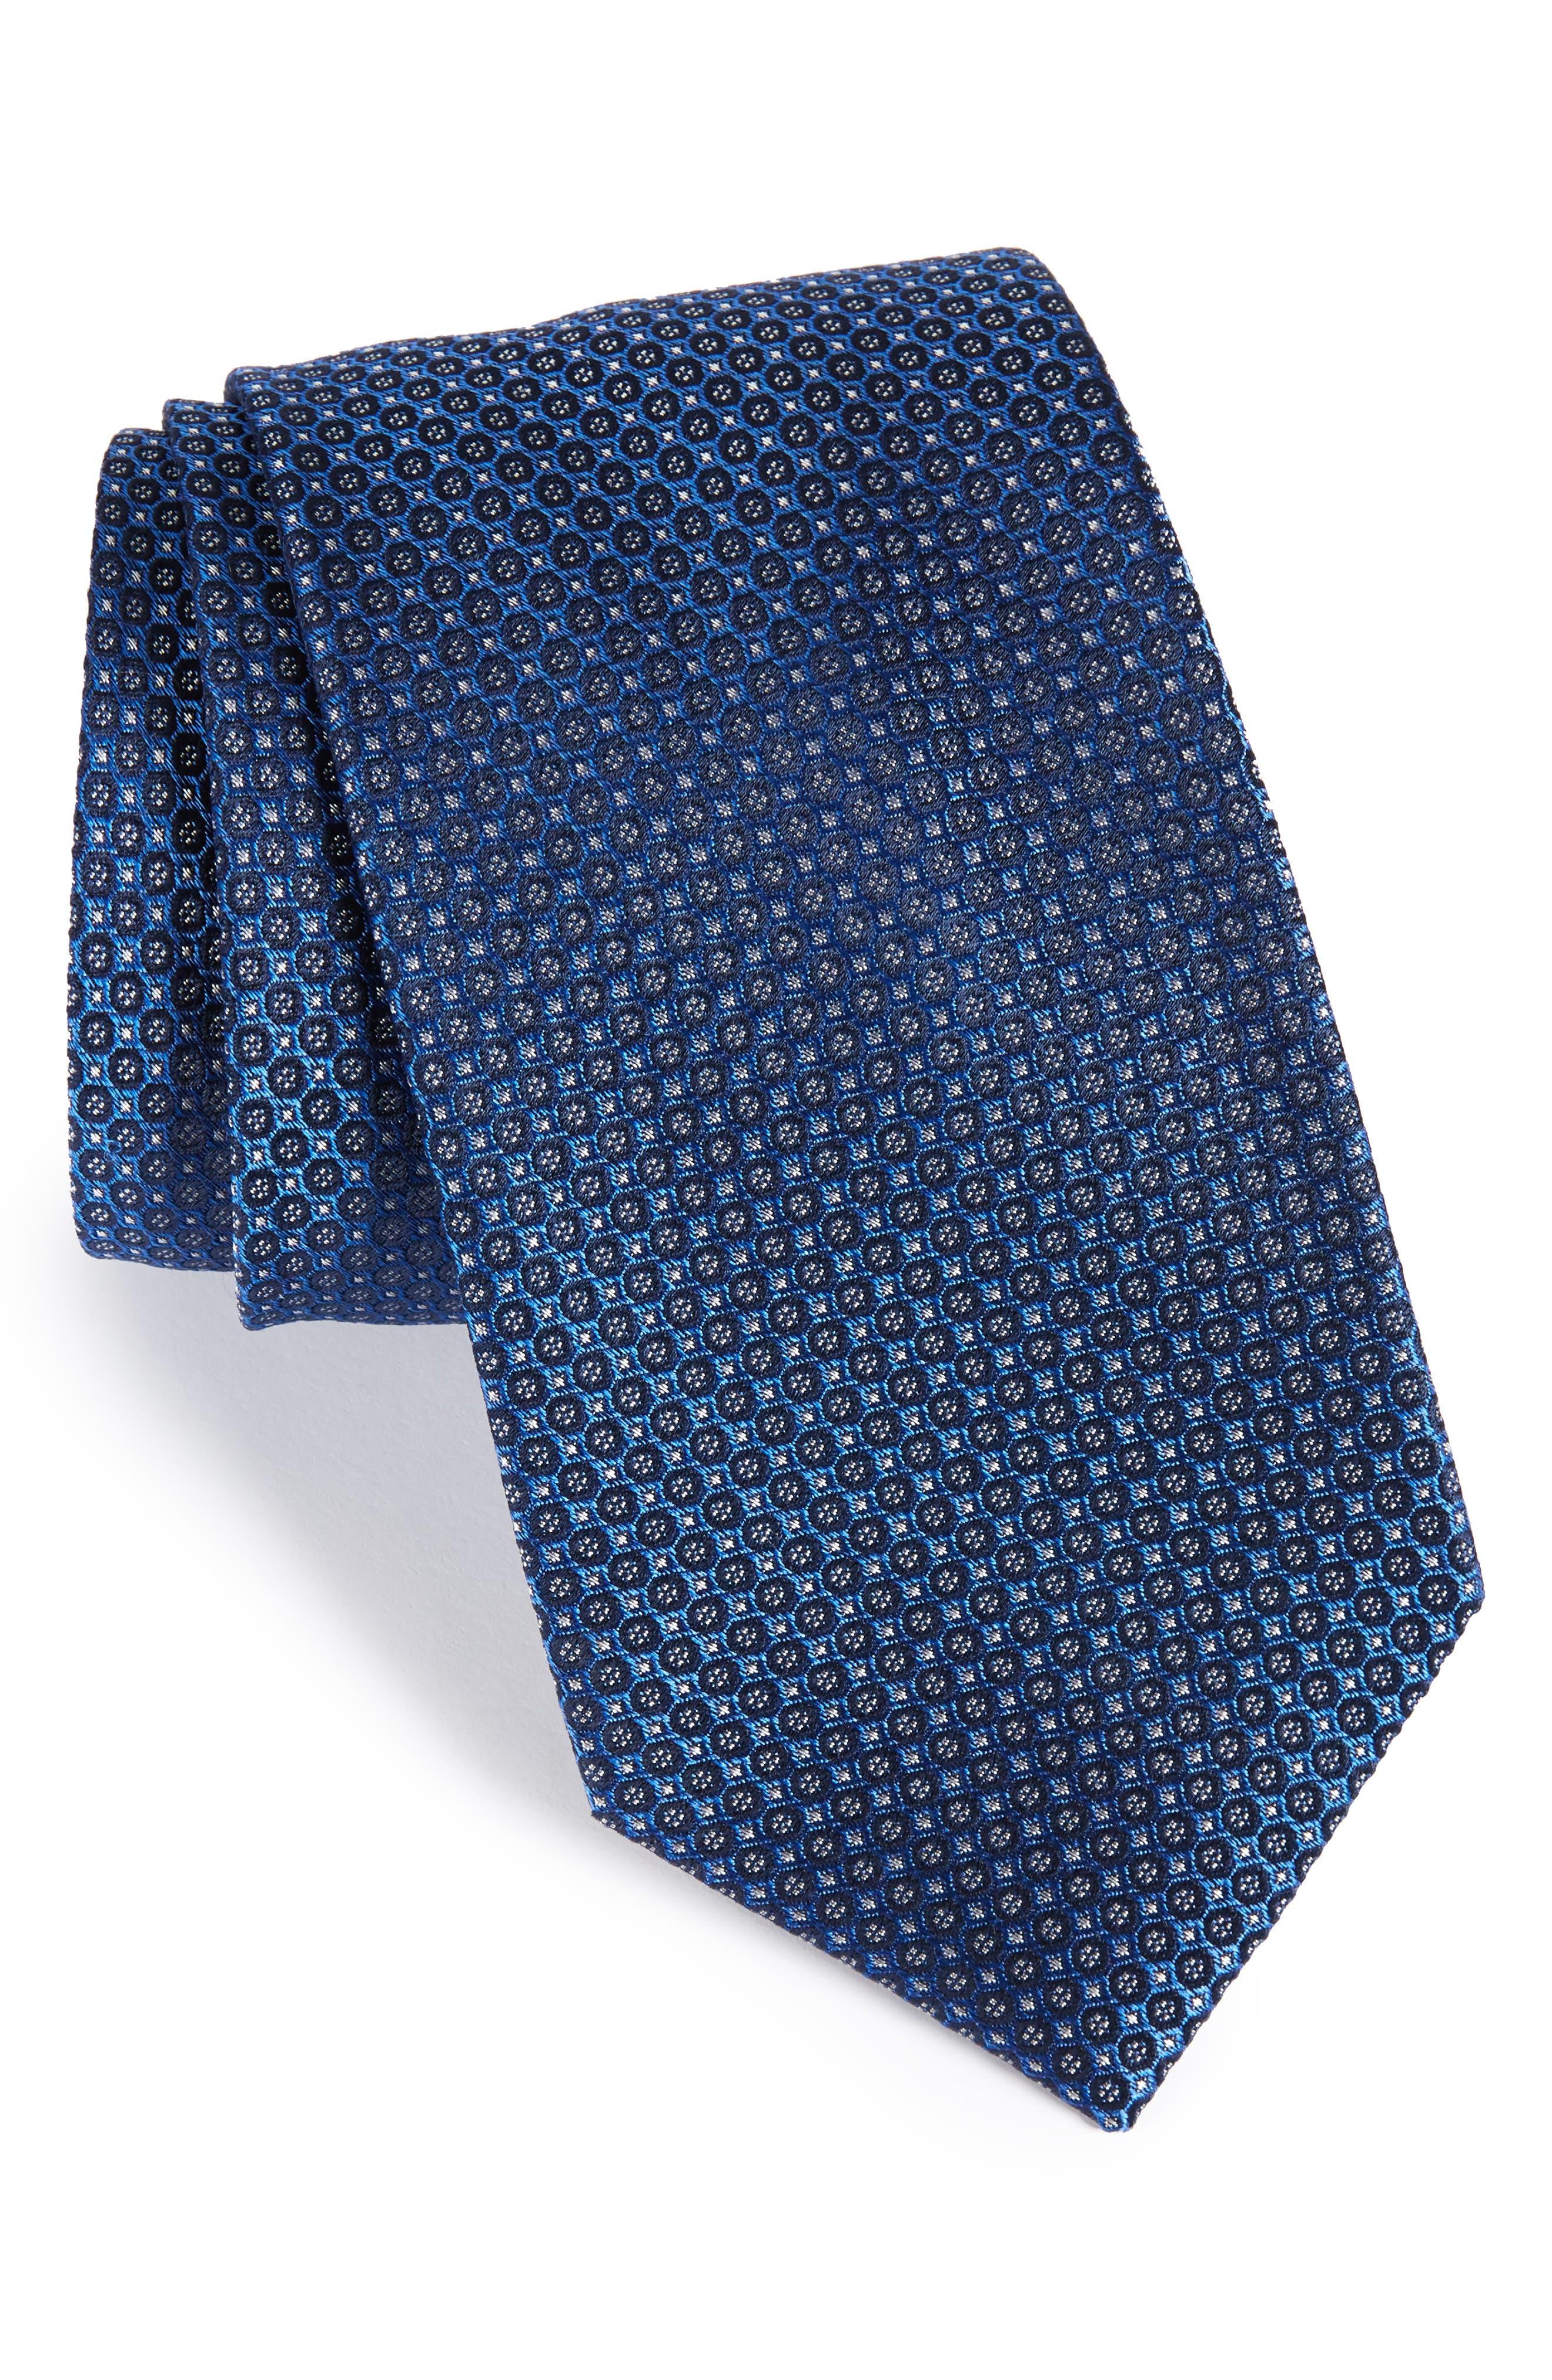 Park Ave Solid Silk Tie,                             Main thumbnail 1, color,                             Sapphire